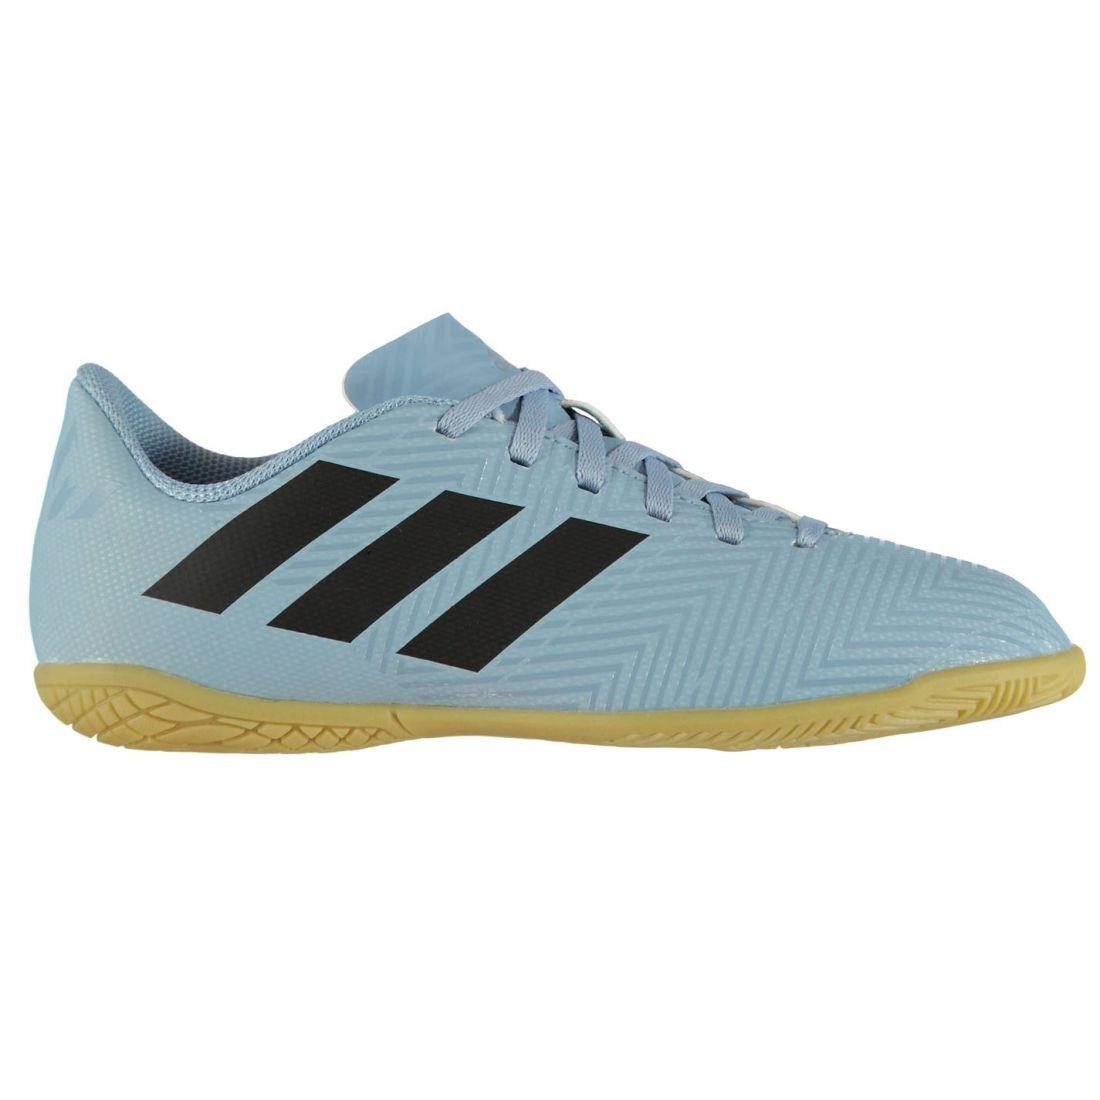 31d20027bc6d1 adidas Kids Nemeziz Messi Tango 18.4 Childs Indoor Football Trainers Boots  Lace